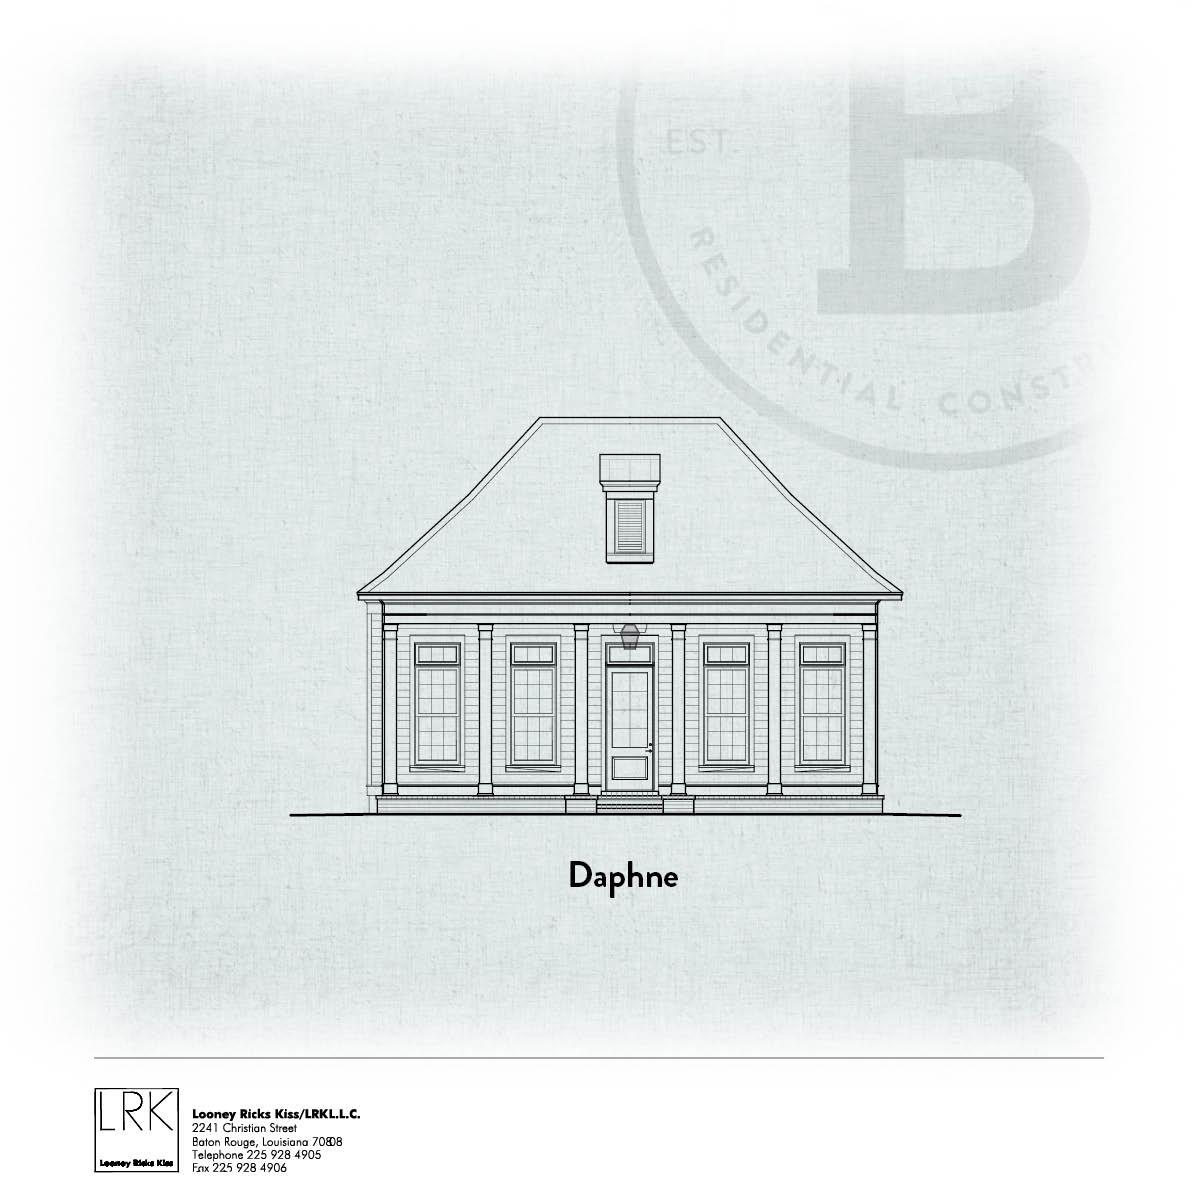 Daphne Elevation